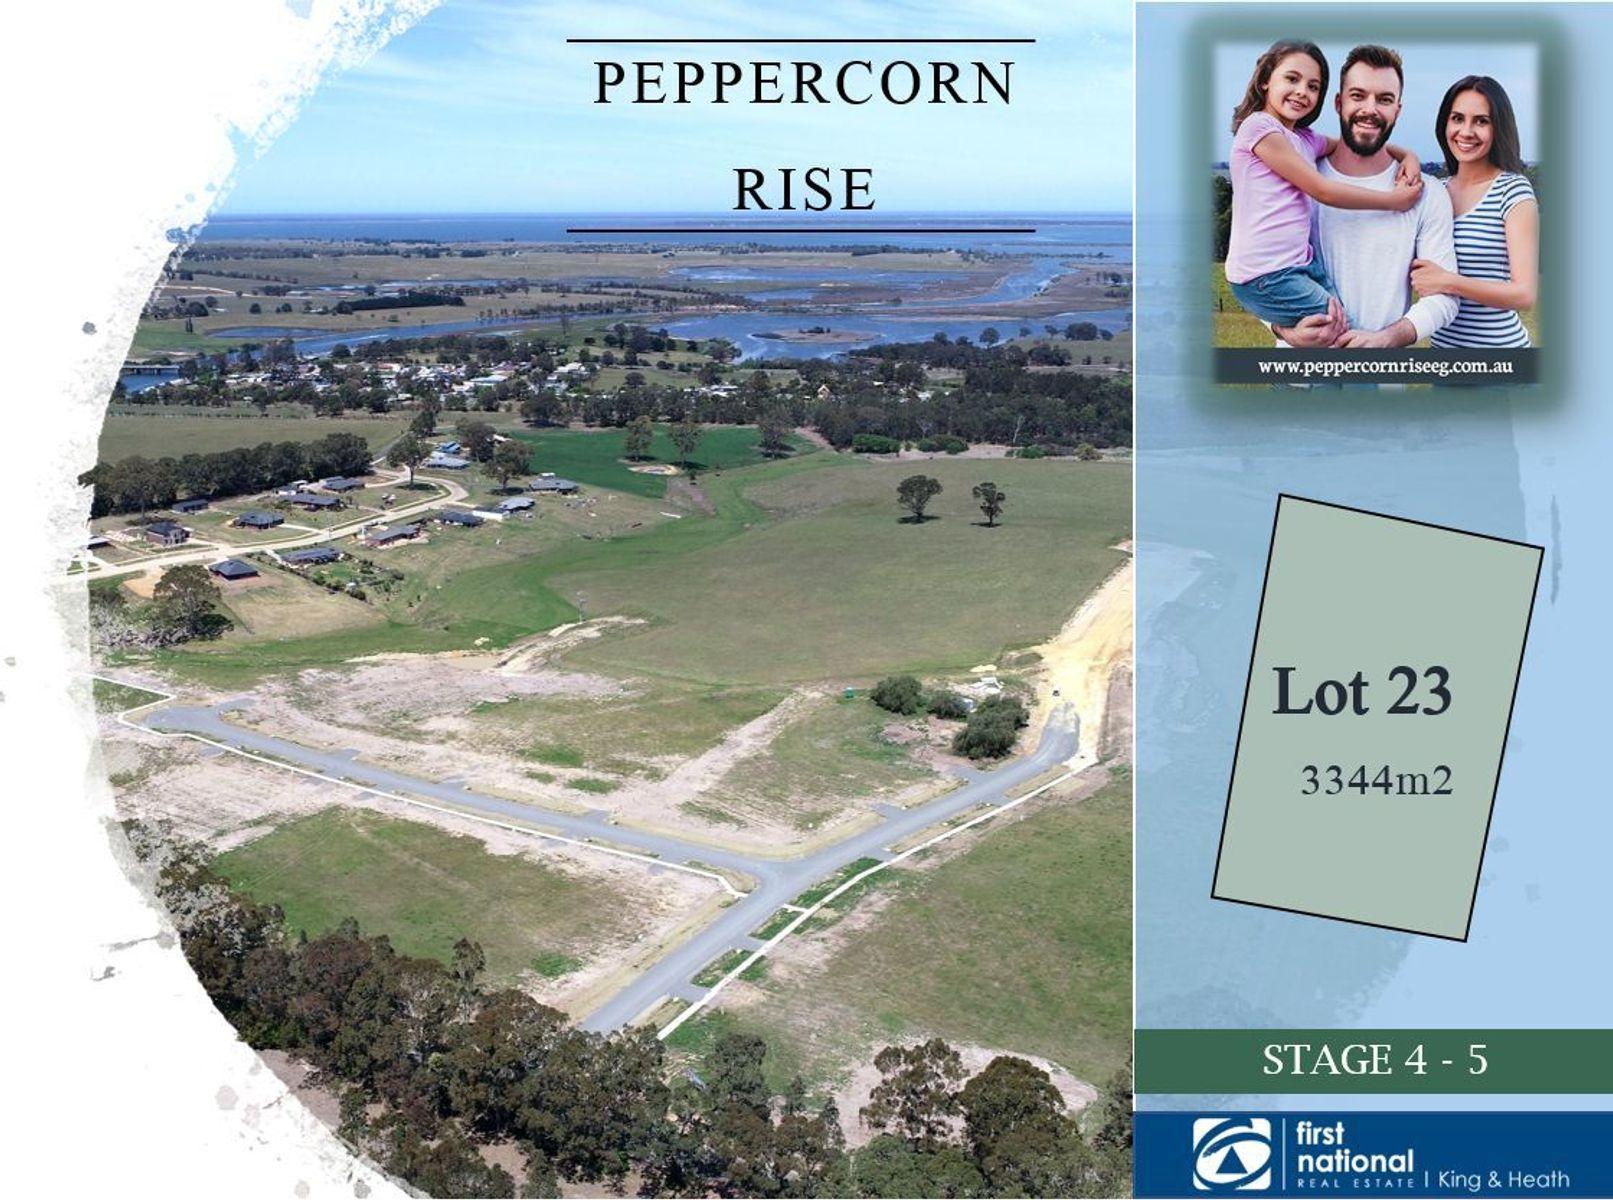 Lot 23 Peppercorn Way, Nicholson, VIC 3882